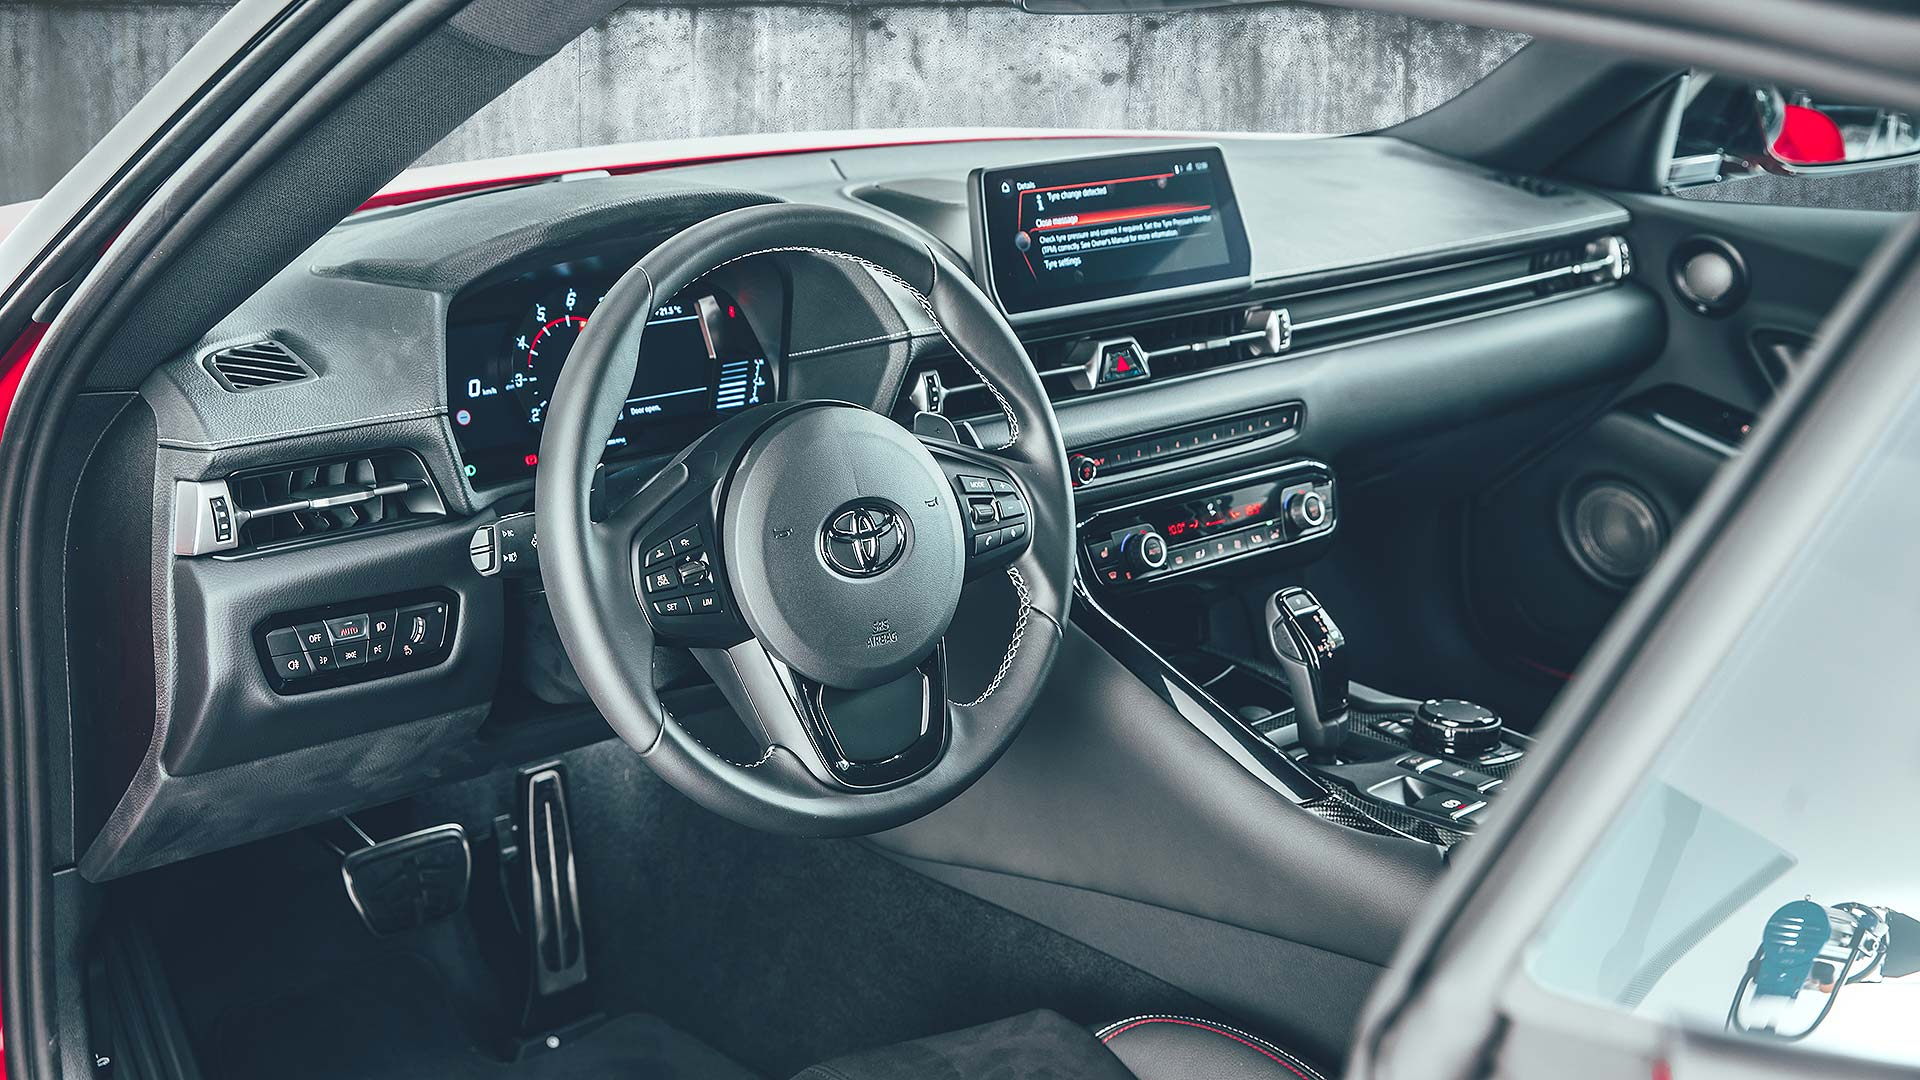 2019 Toyota GR Supra A90